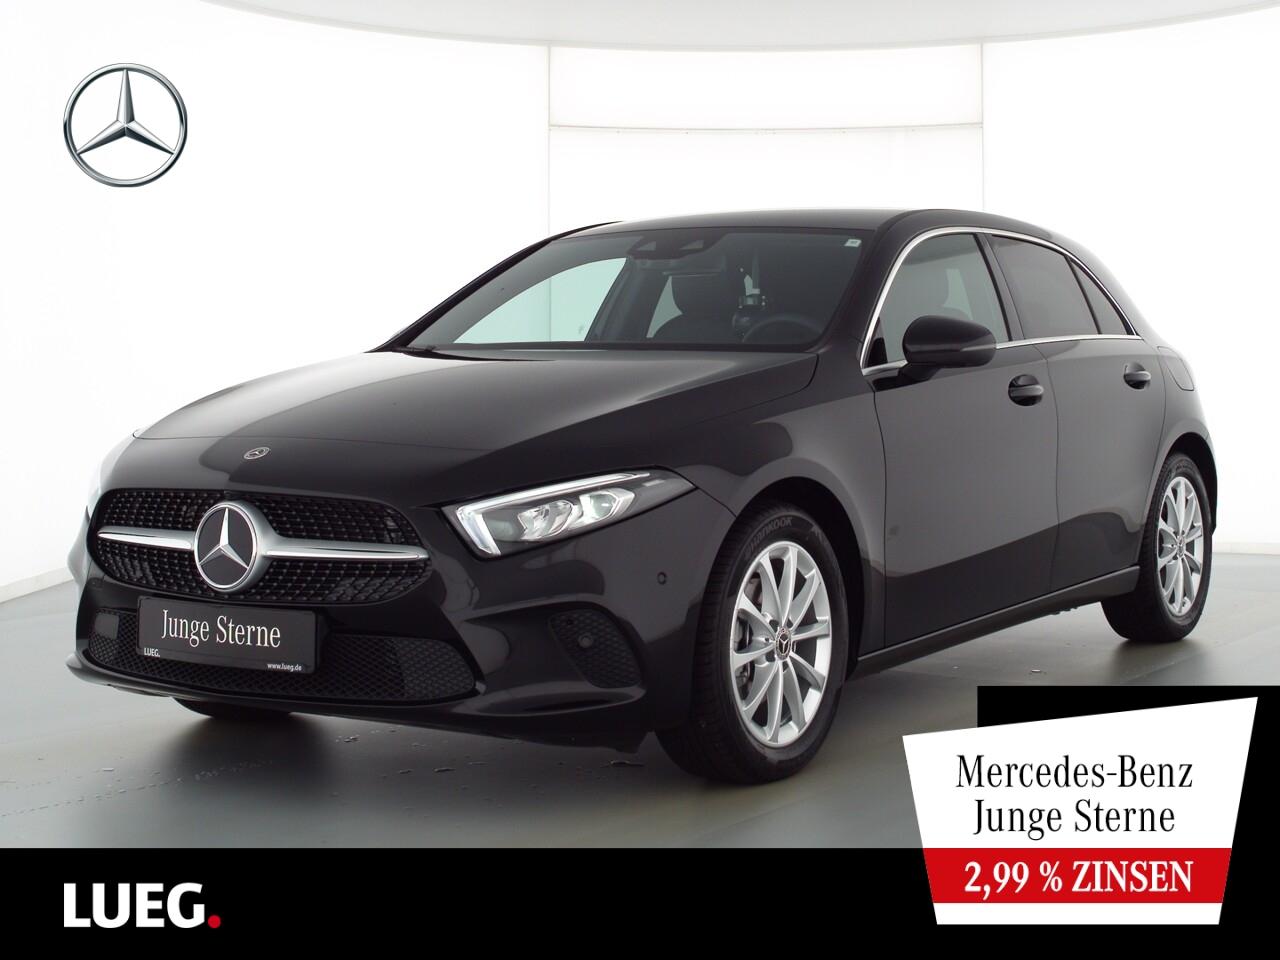 Mercedes-Benz A 180 Progressive+MBUXHighEnd+LED-HP+ParkAss+360, Jahr 2021, Benzin